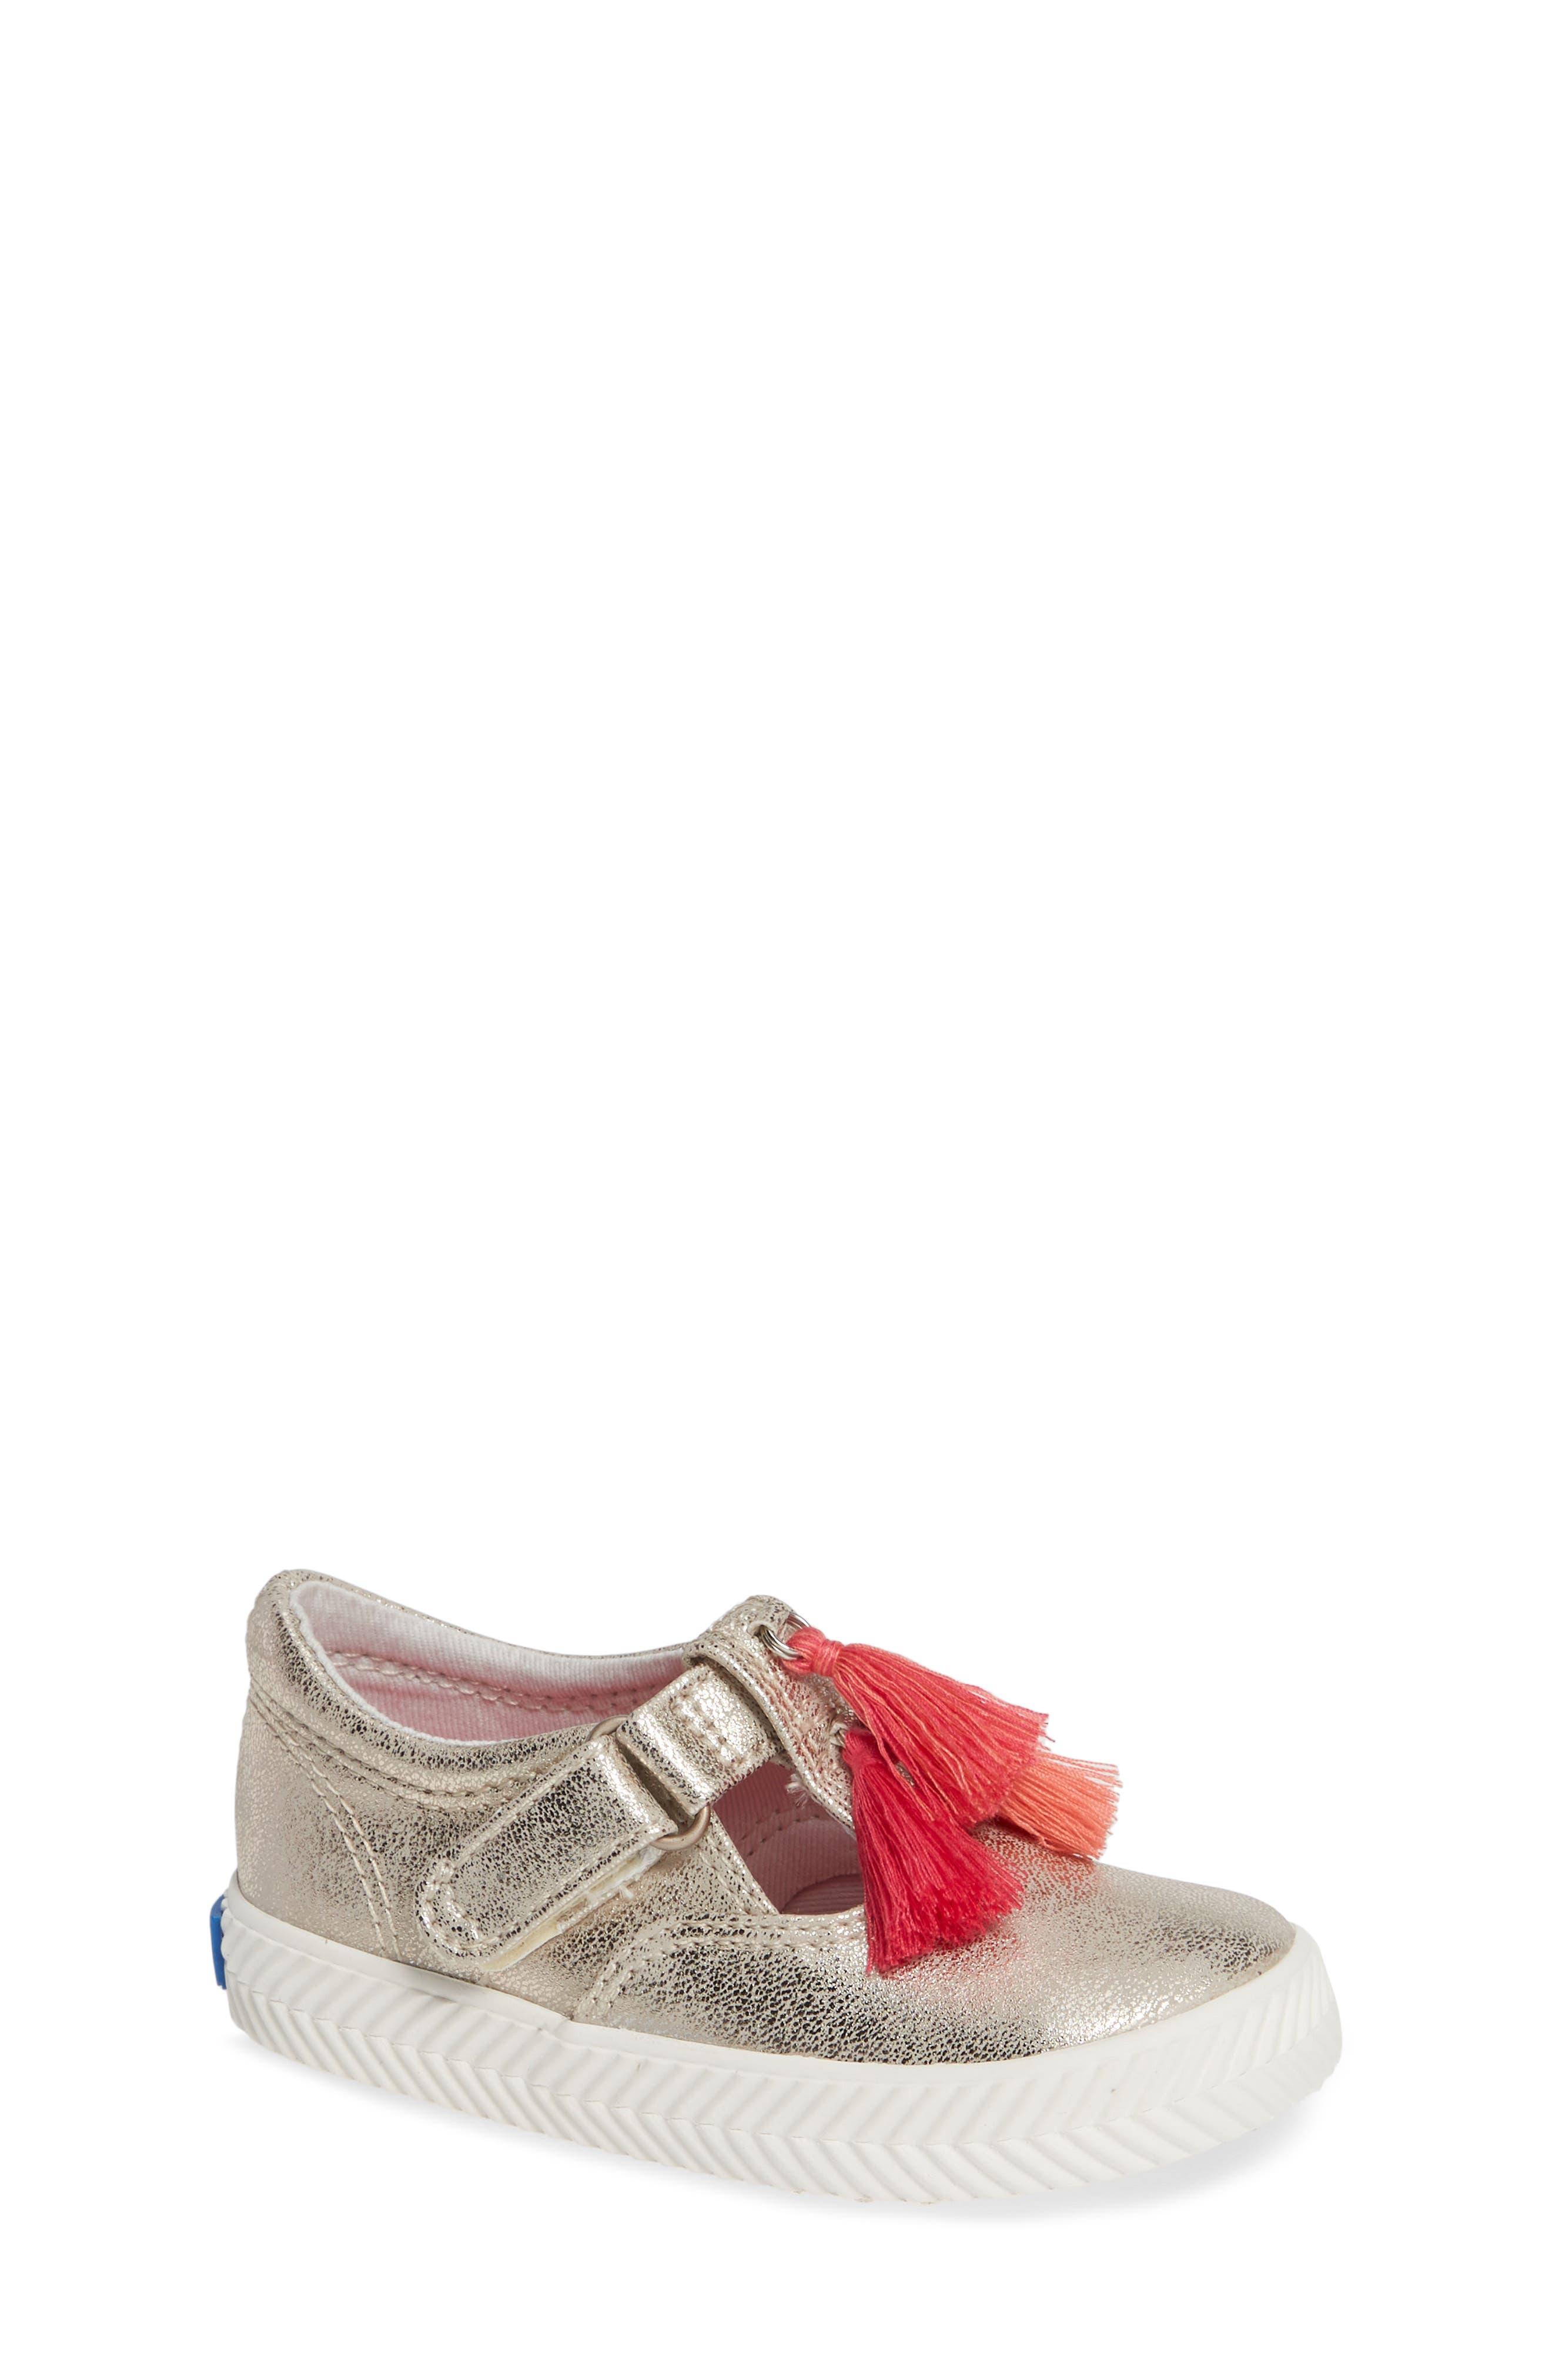 Daphne T-Strap Sneaker,                             Main thumbnail 1, color,                             GOLD/ GOLD